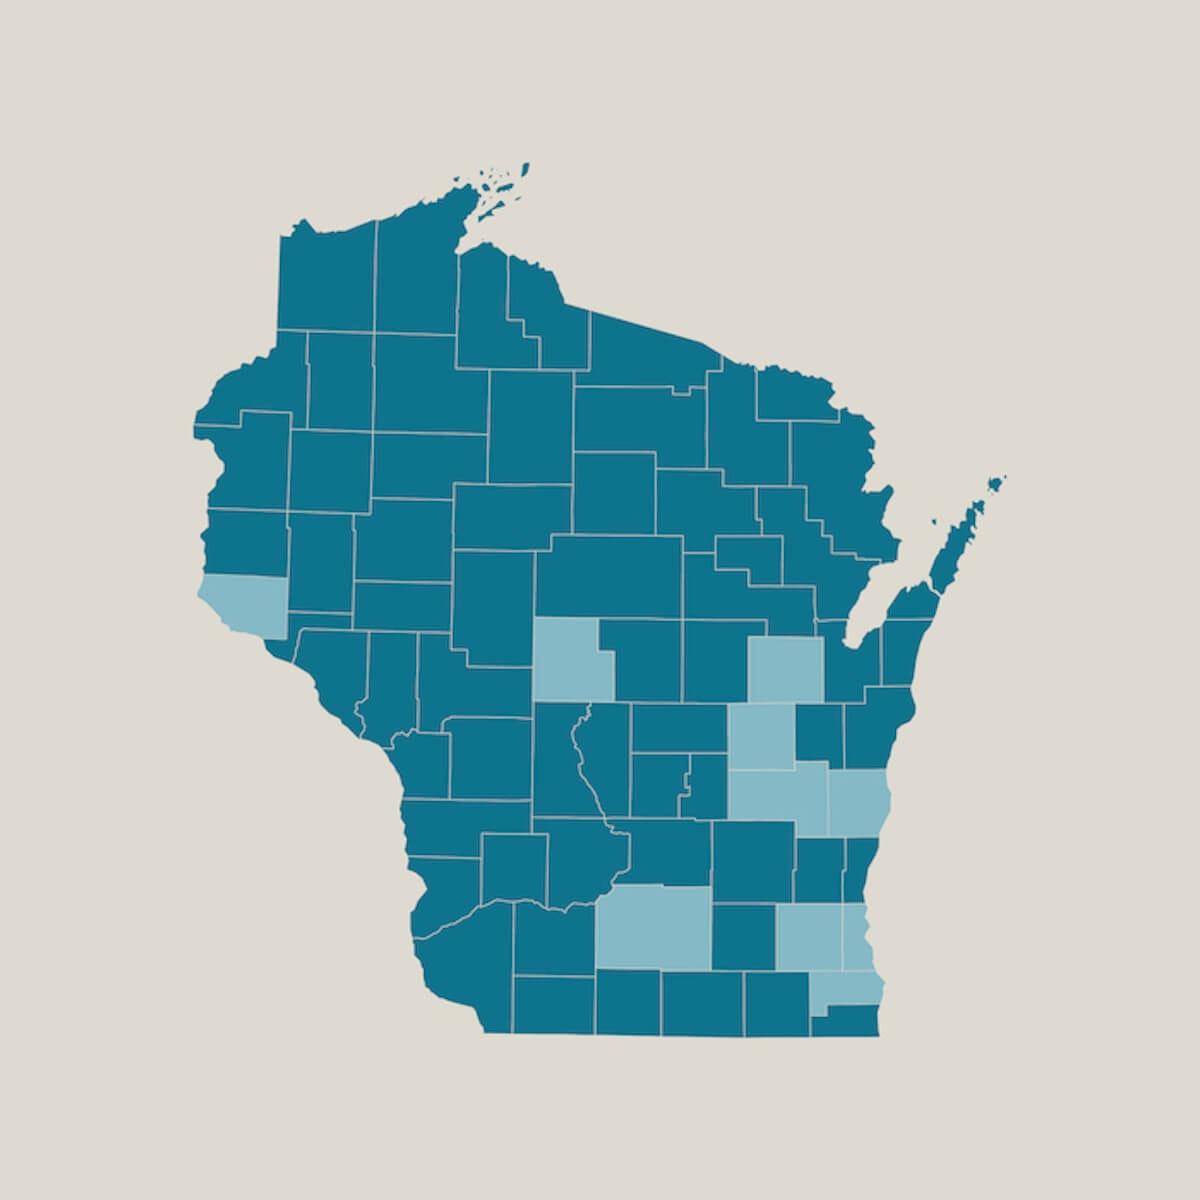 COVID-19, the illness that stems from coronavirus, has affected people from Dane, Fond du Lac, Milwaukee, Outagamie, Pierce, Racine, Sheboygan, Waukesha, Winnebago, and Wood counties.